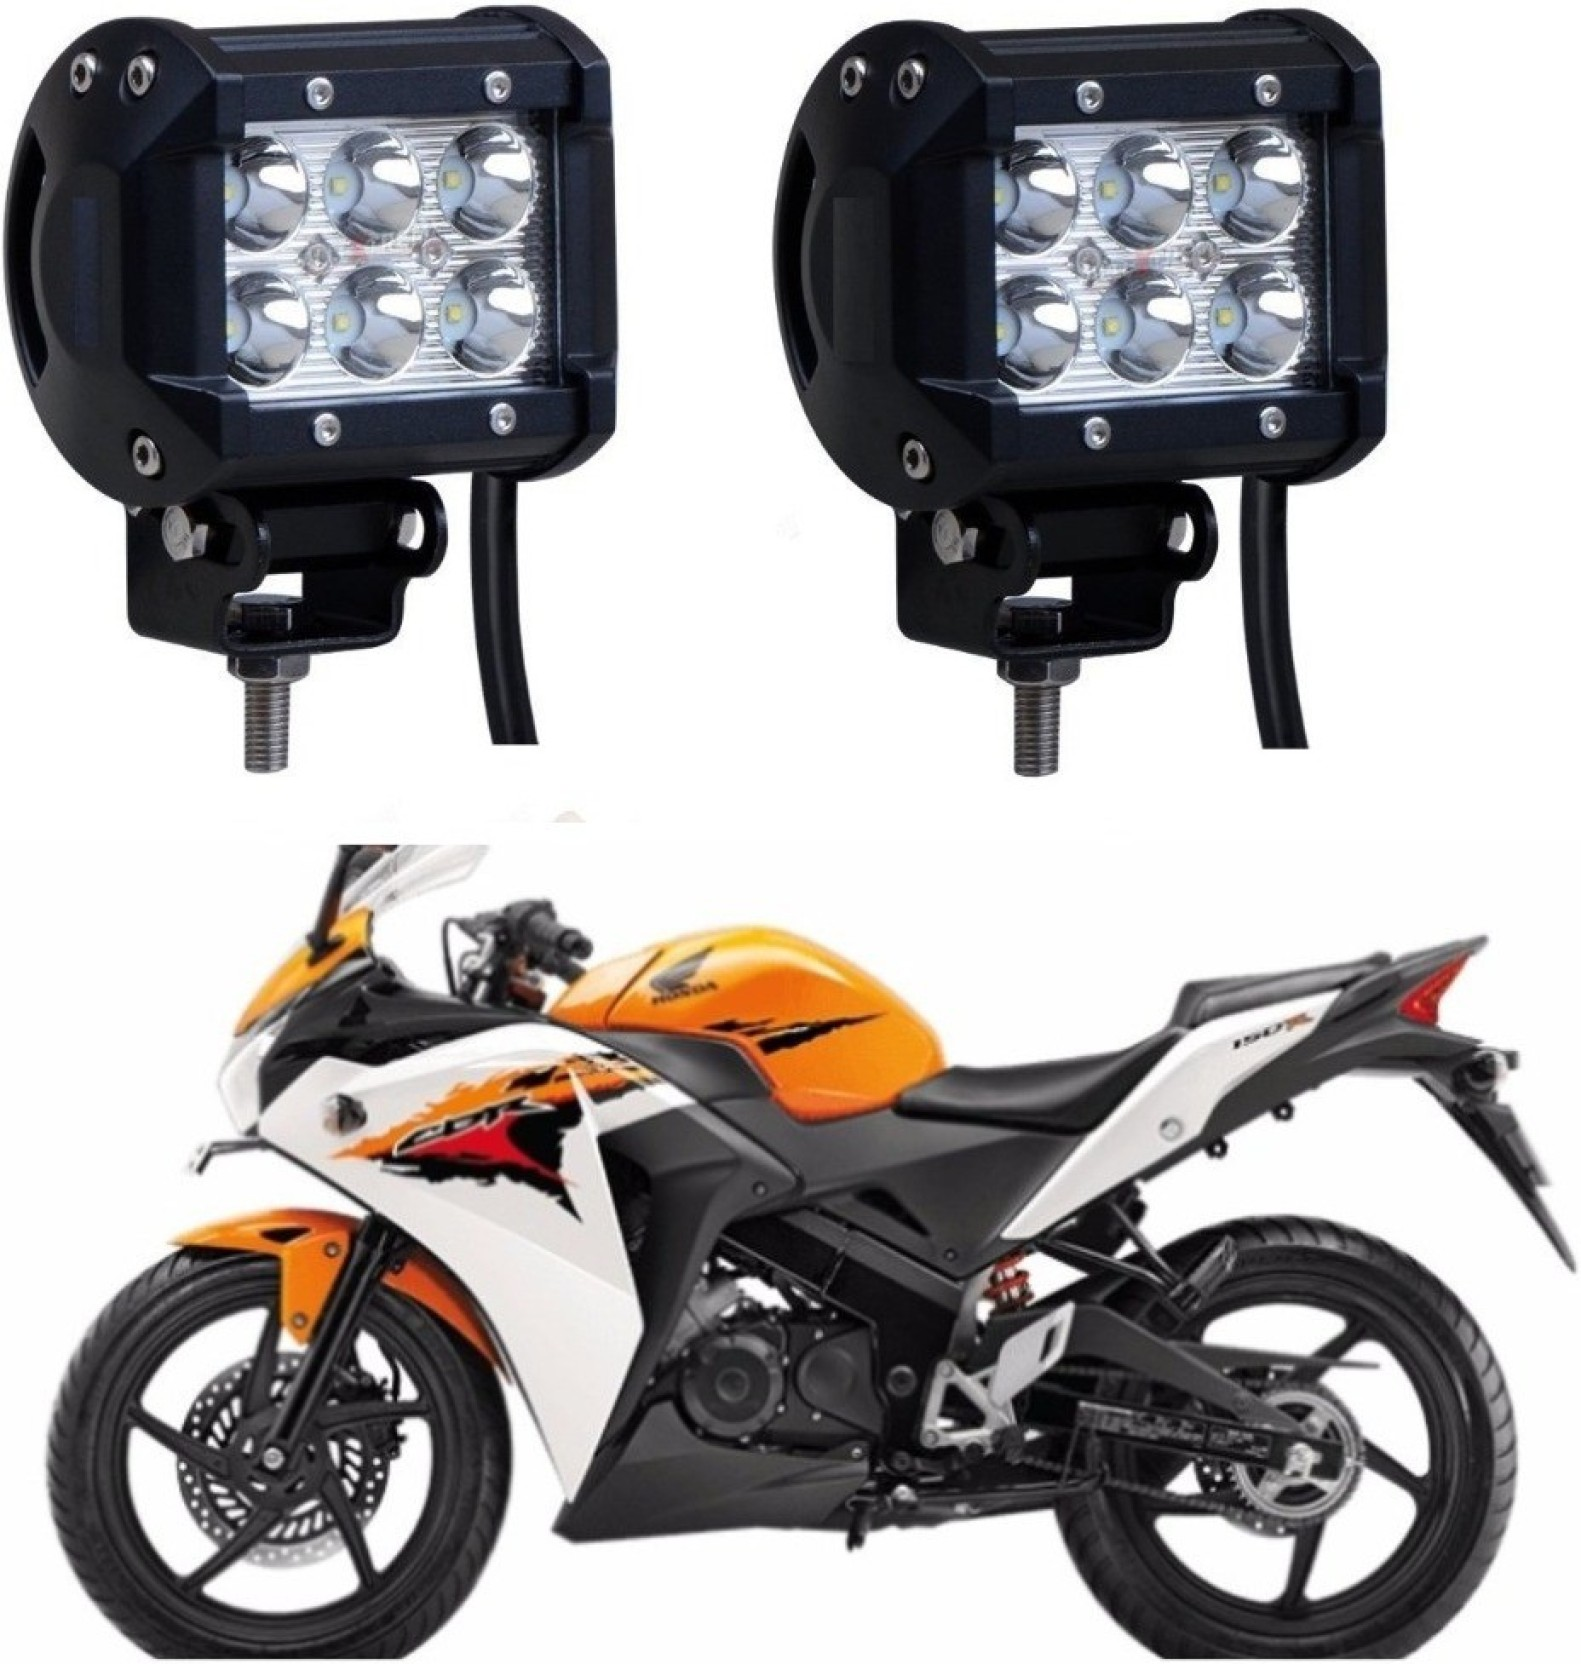 Auto Garh Back Up Lamp Fog Headlight Tail Light Led For Cbr T Shirt On Offer Add To Cart